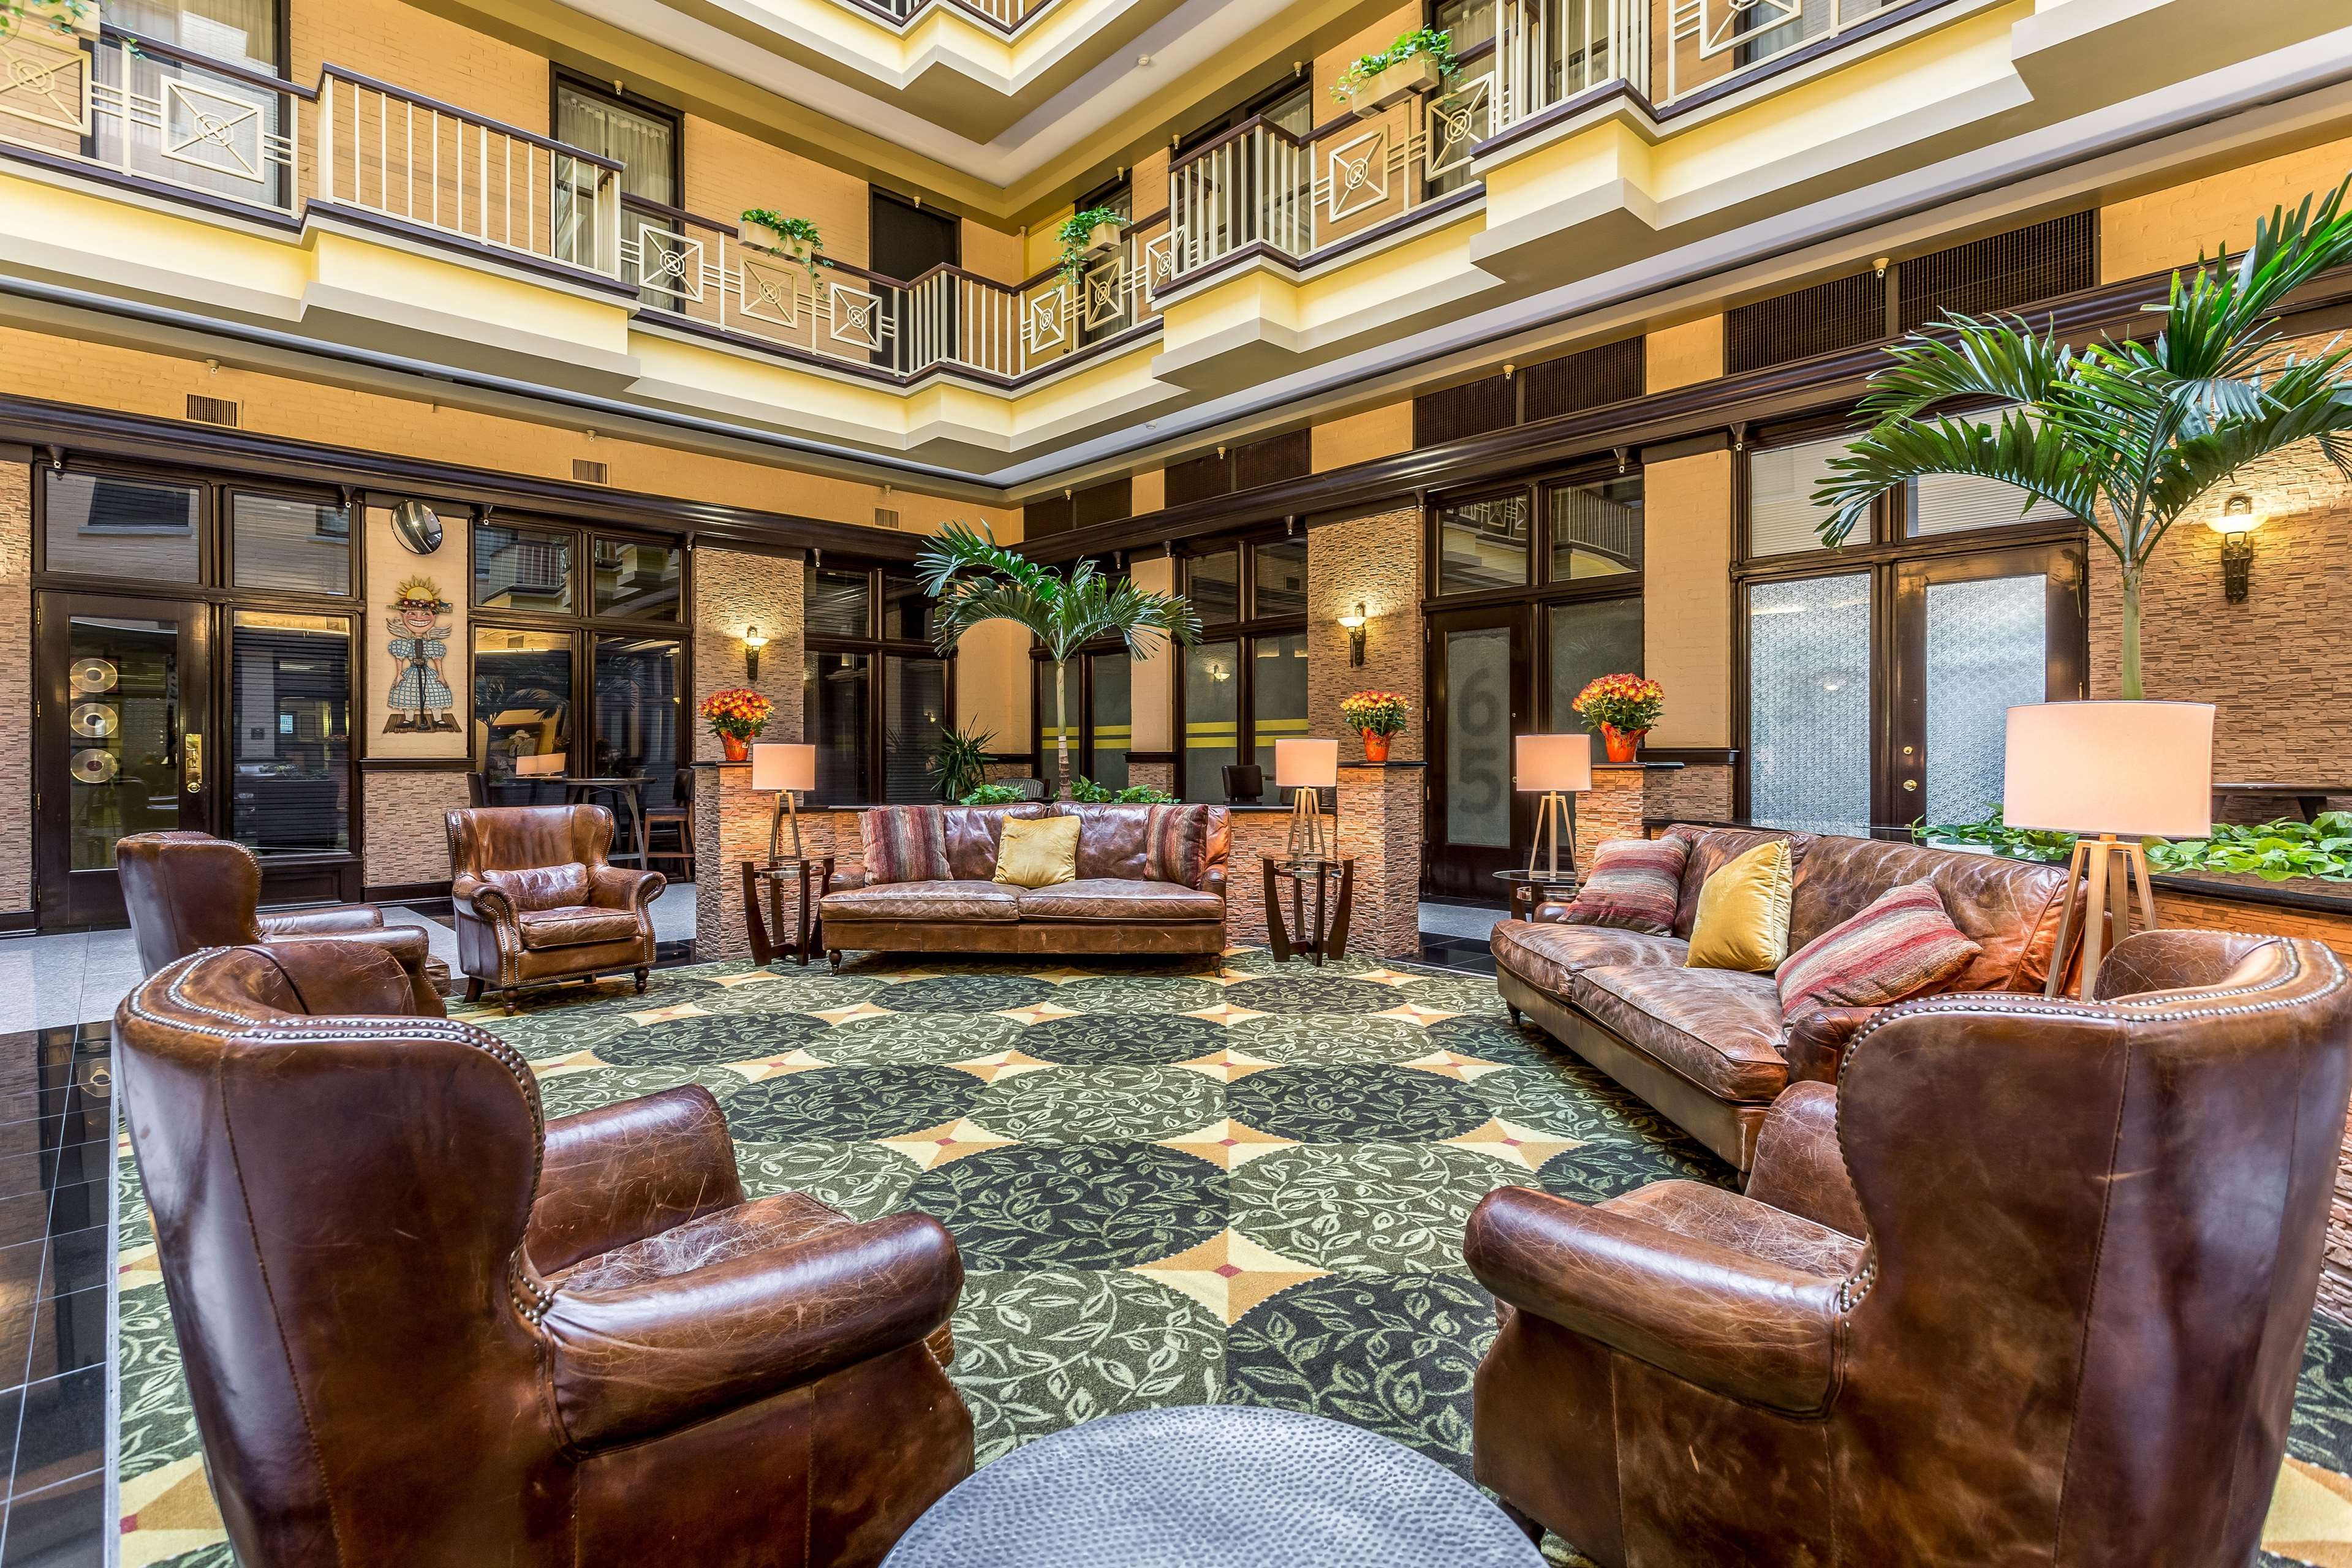 Homewood Suites by Hilton Nashville-Downtown image 2